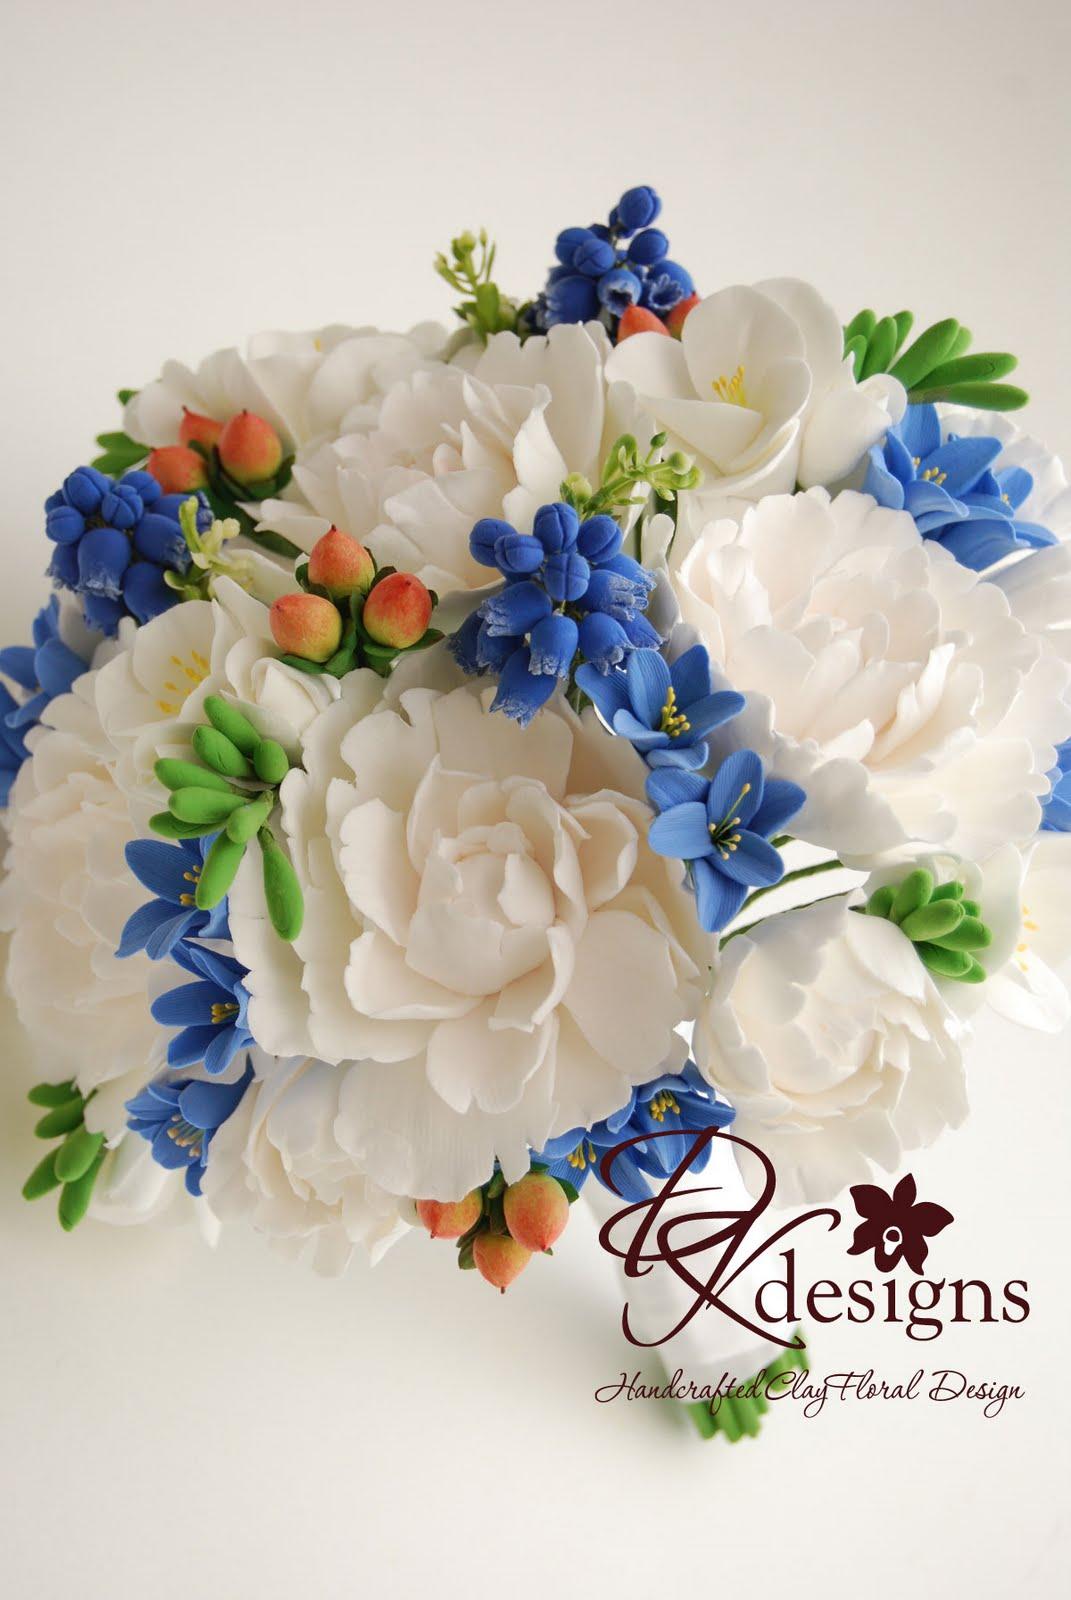 Peonies, Grape Hyacinth, Blue Hyacinth and Hipericum Berry Bouquet ...